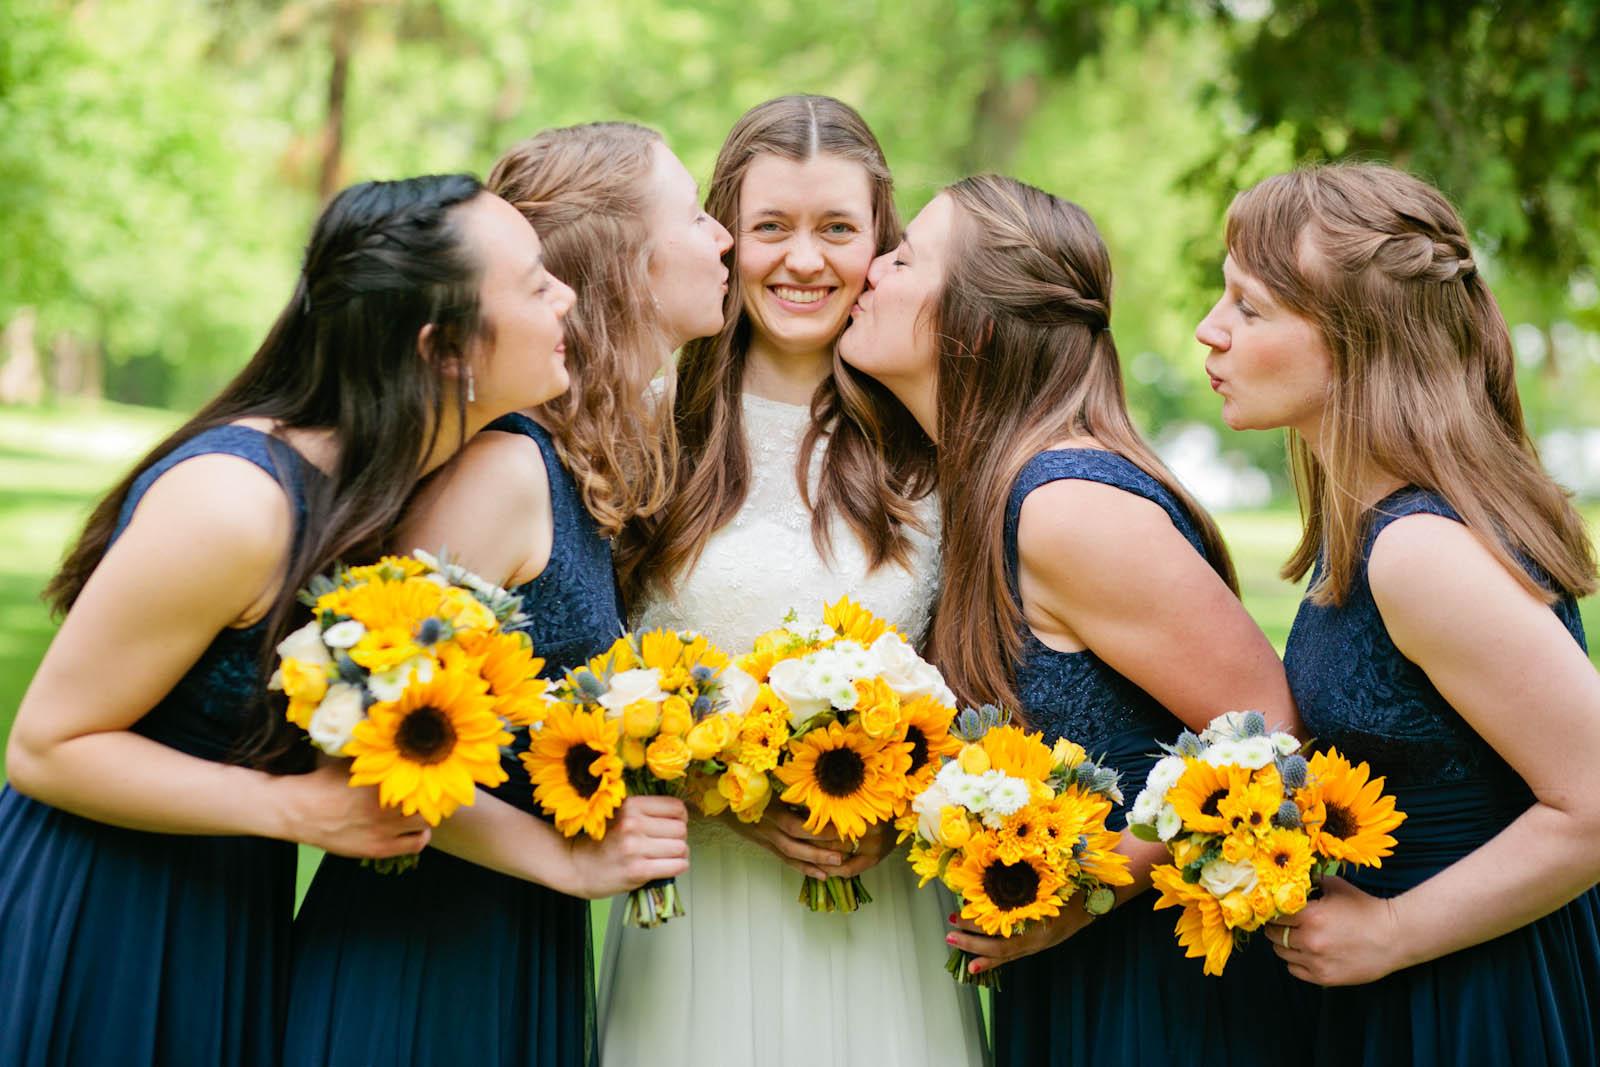 sunflowers wedding bouquets bride minnesota